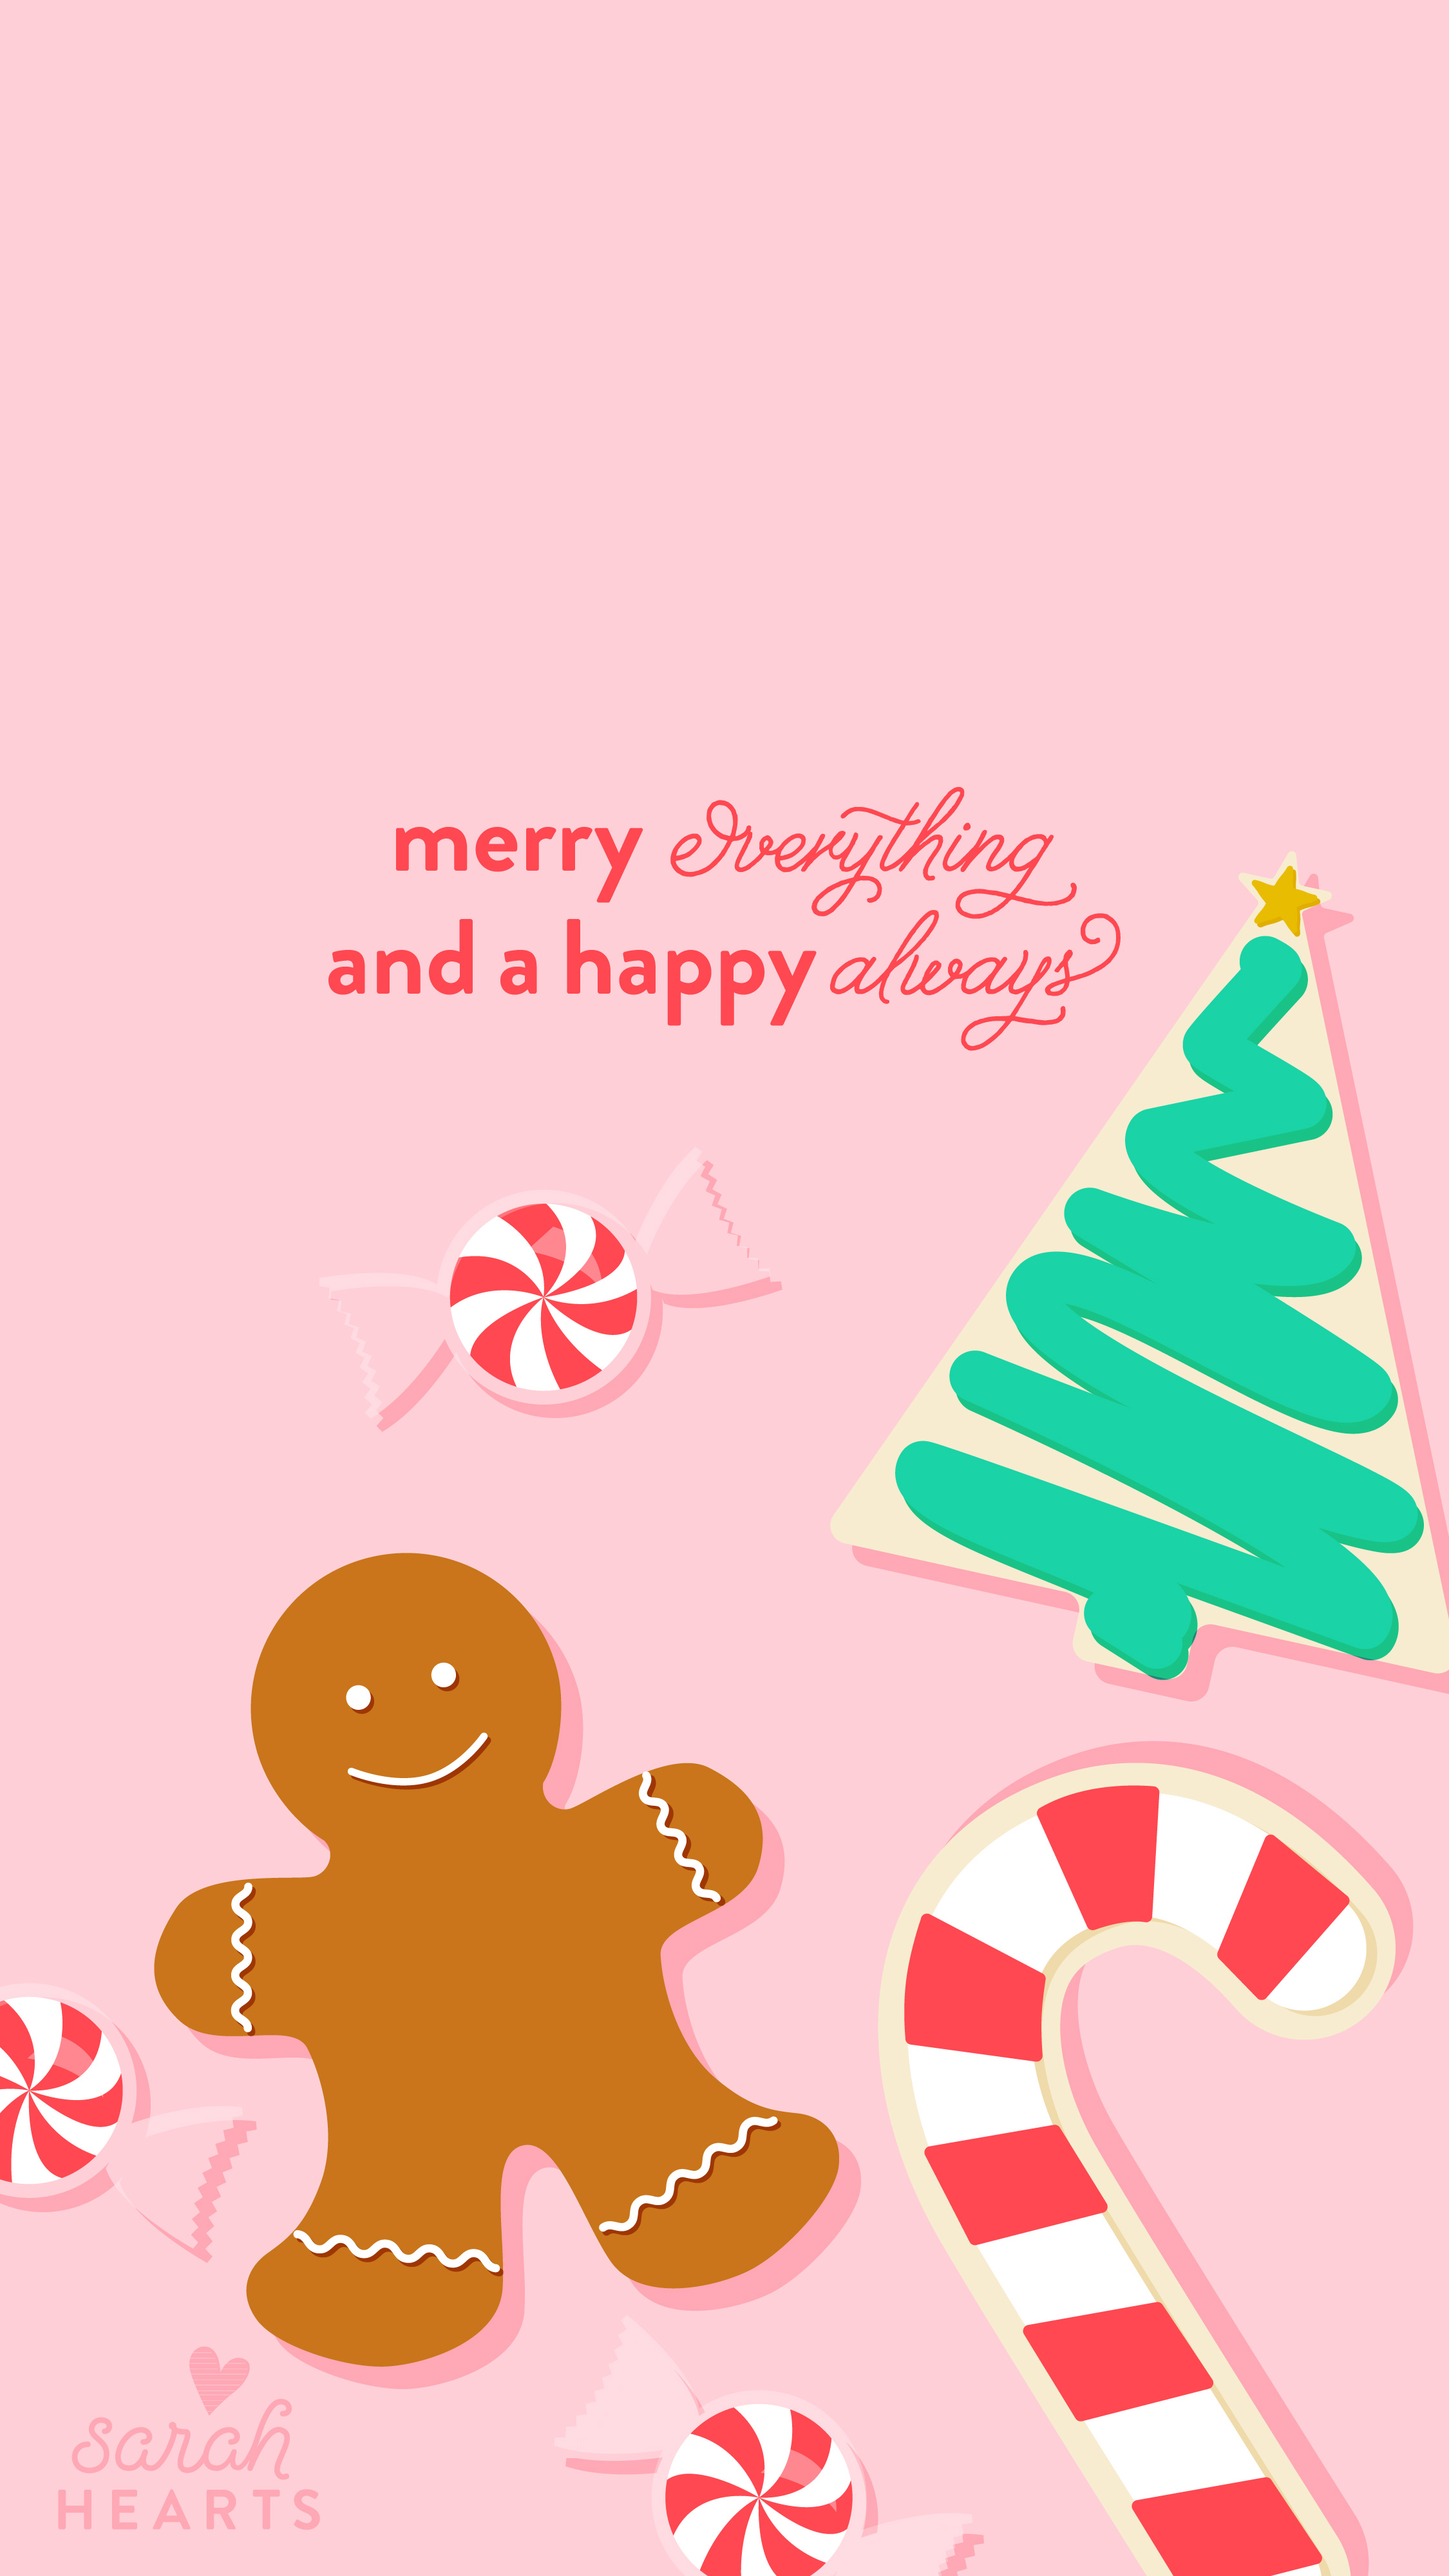 Cute Kids Wallpapers Free Download December 2016 Christmas Cookie Calendar Wallpaper Sarah